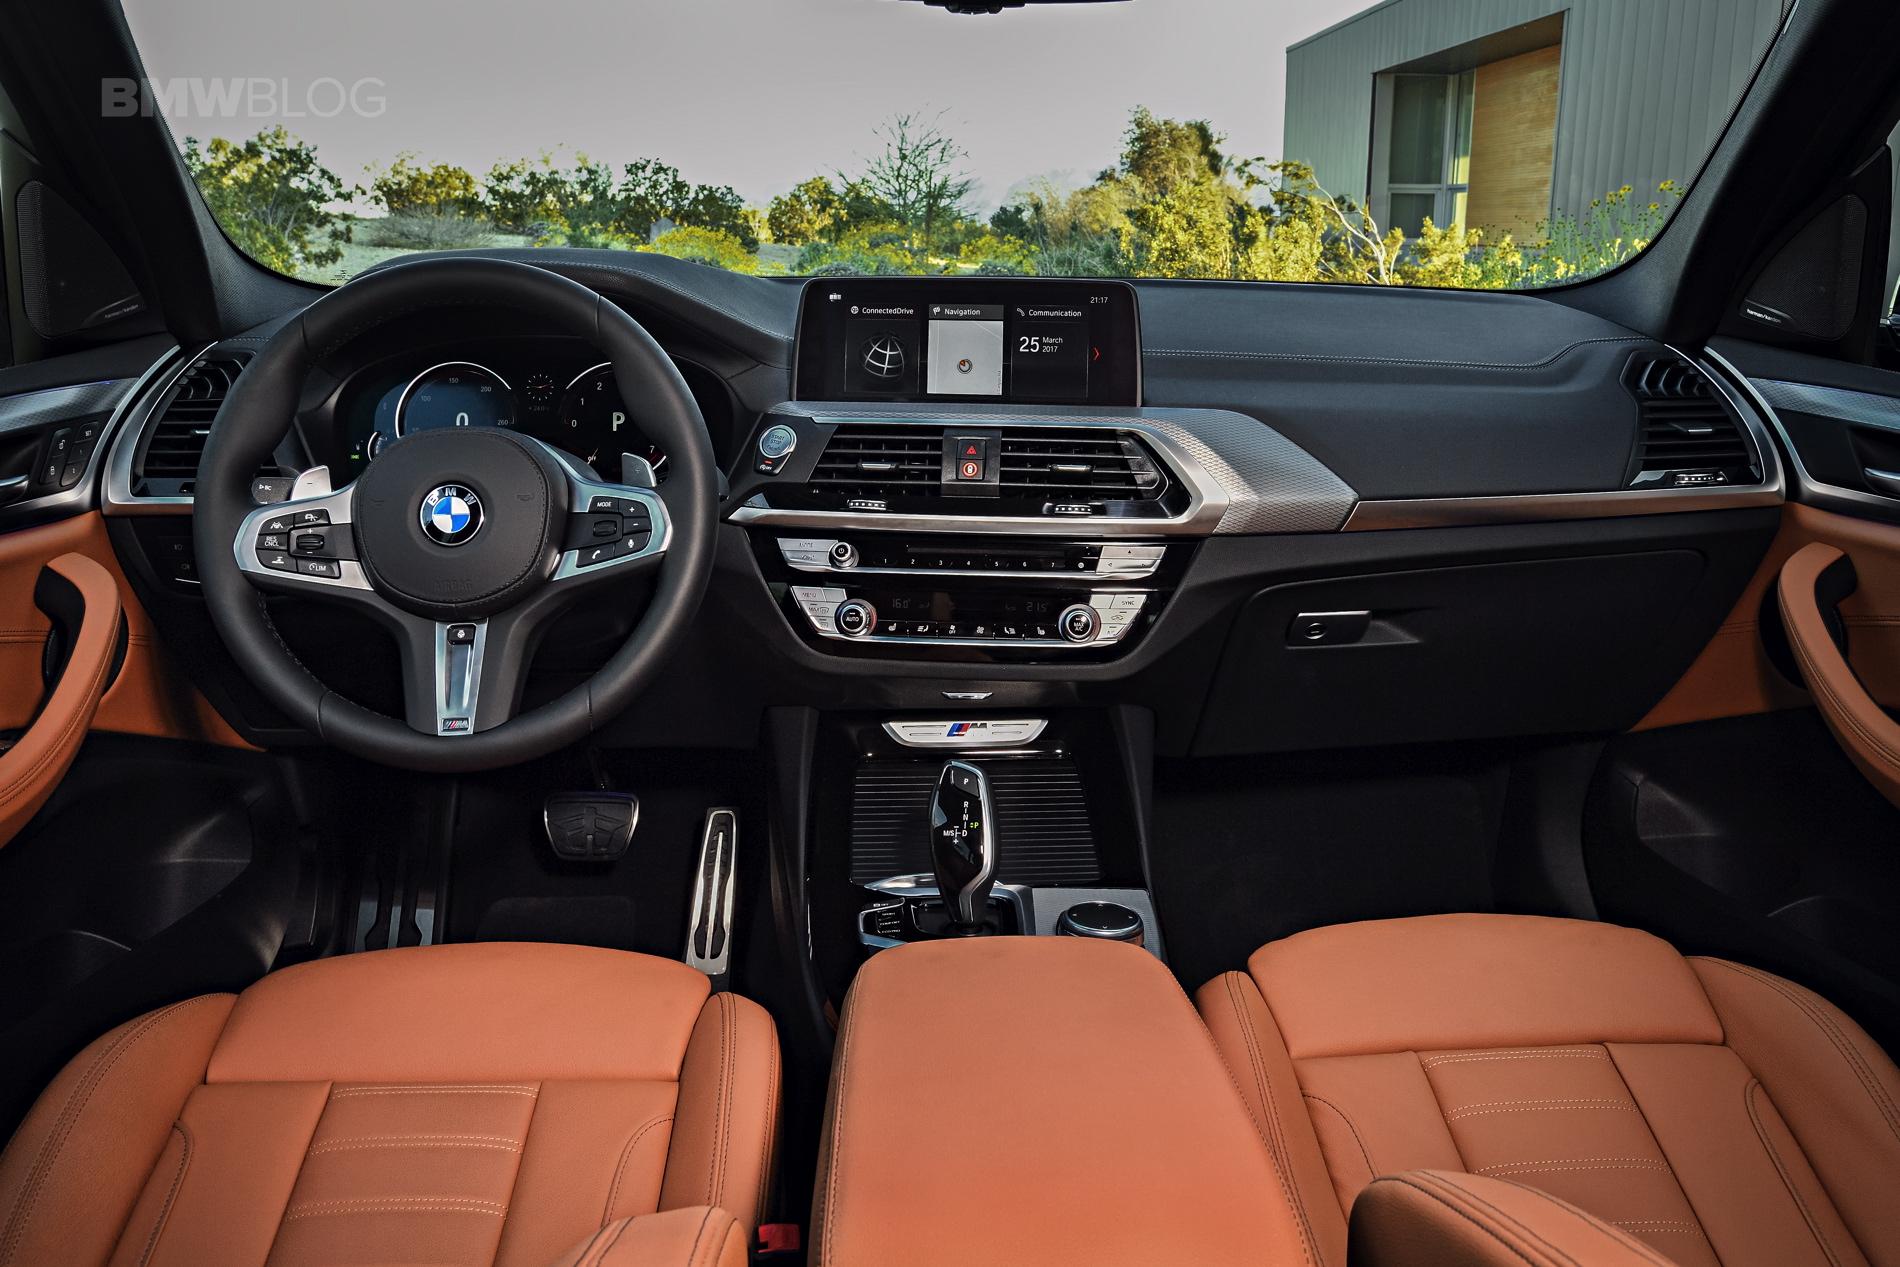 2018-BMW-X3-G01-23